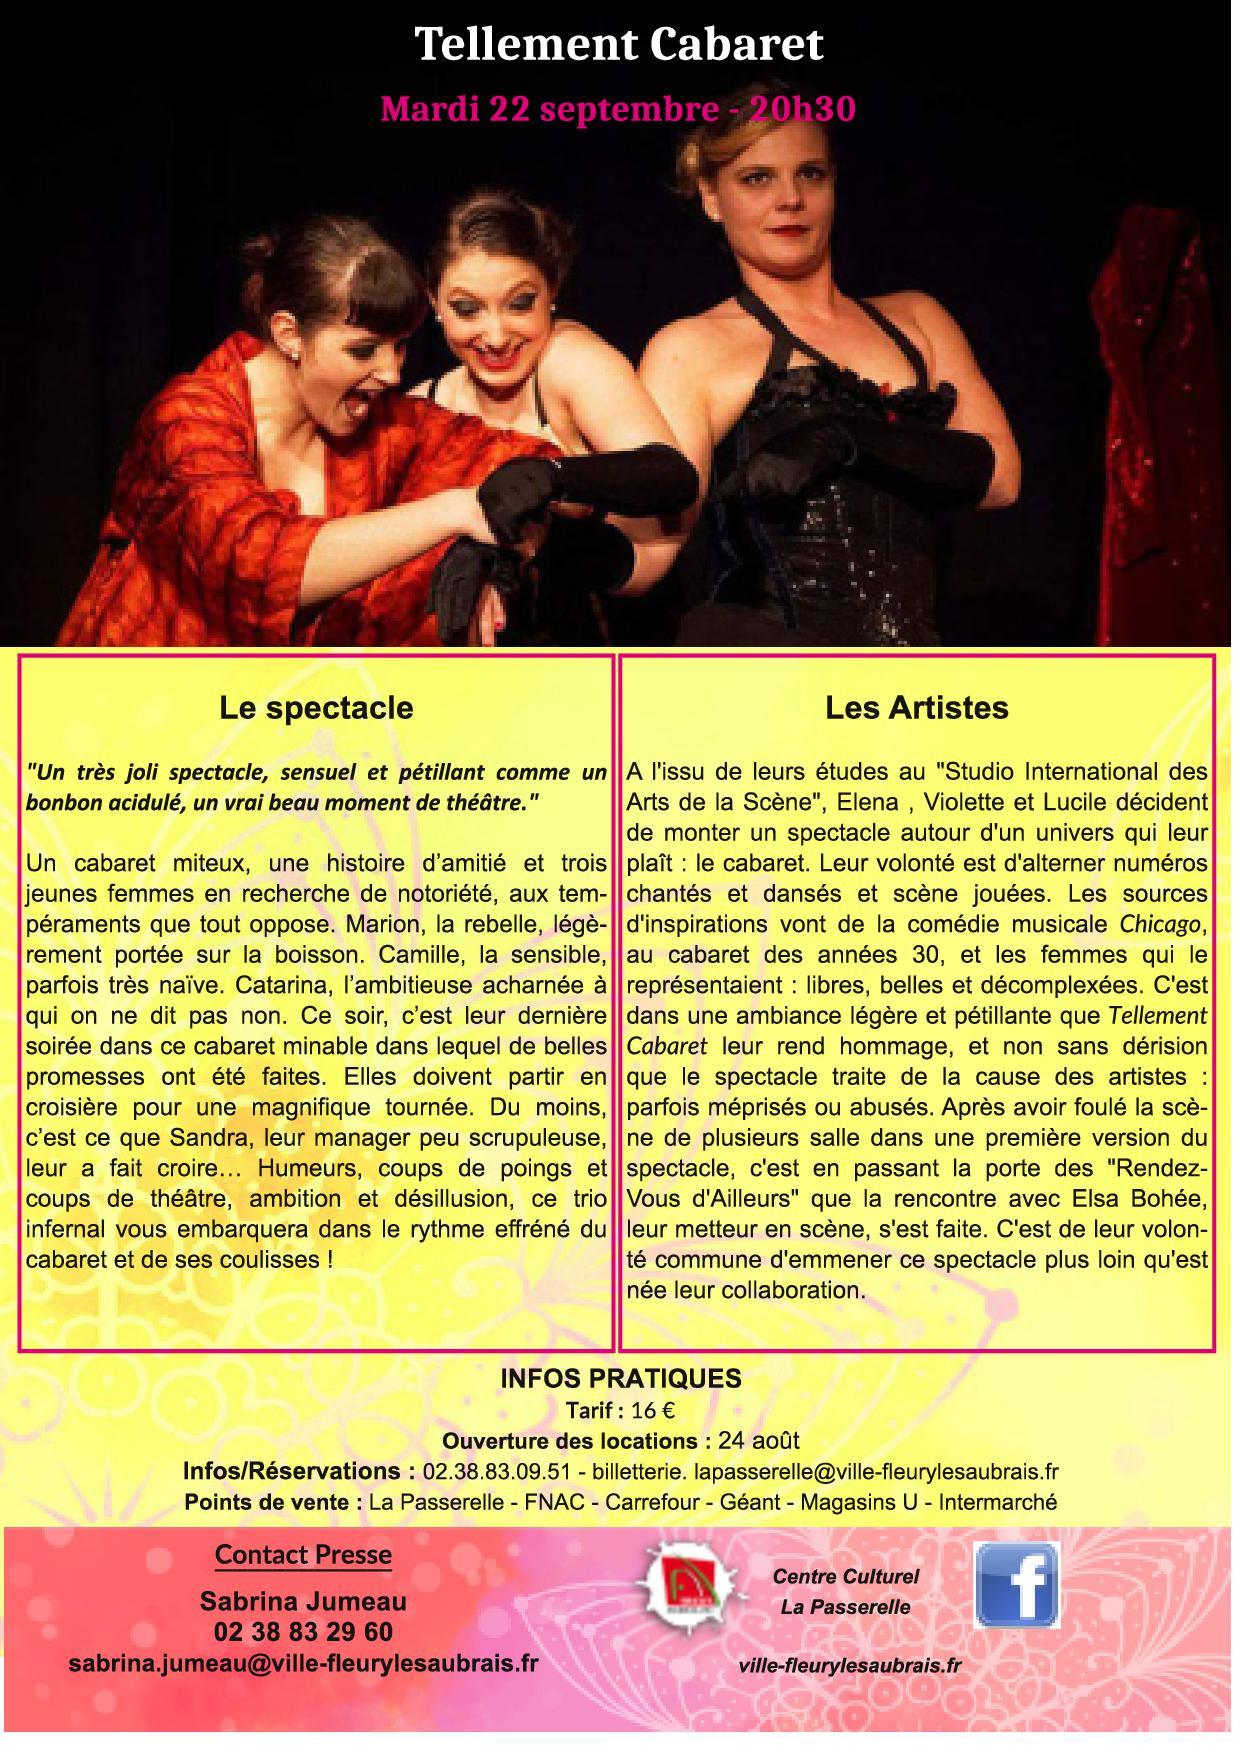 Tellement Cabaret - 22 septembre.jpg